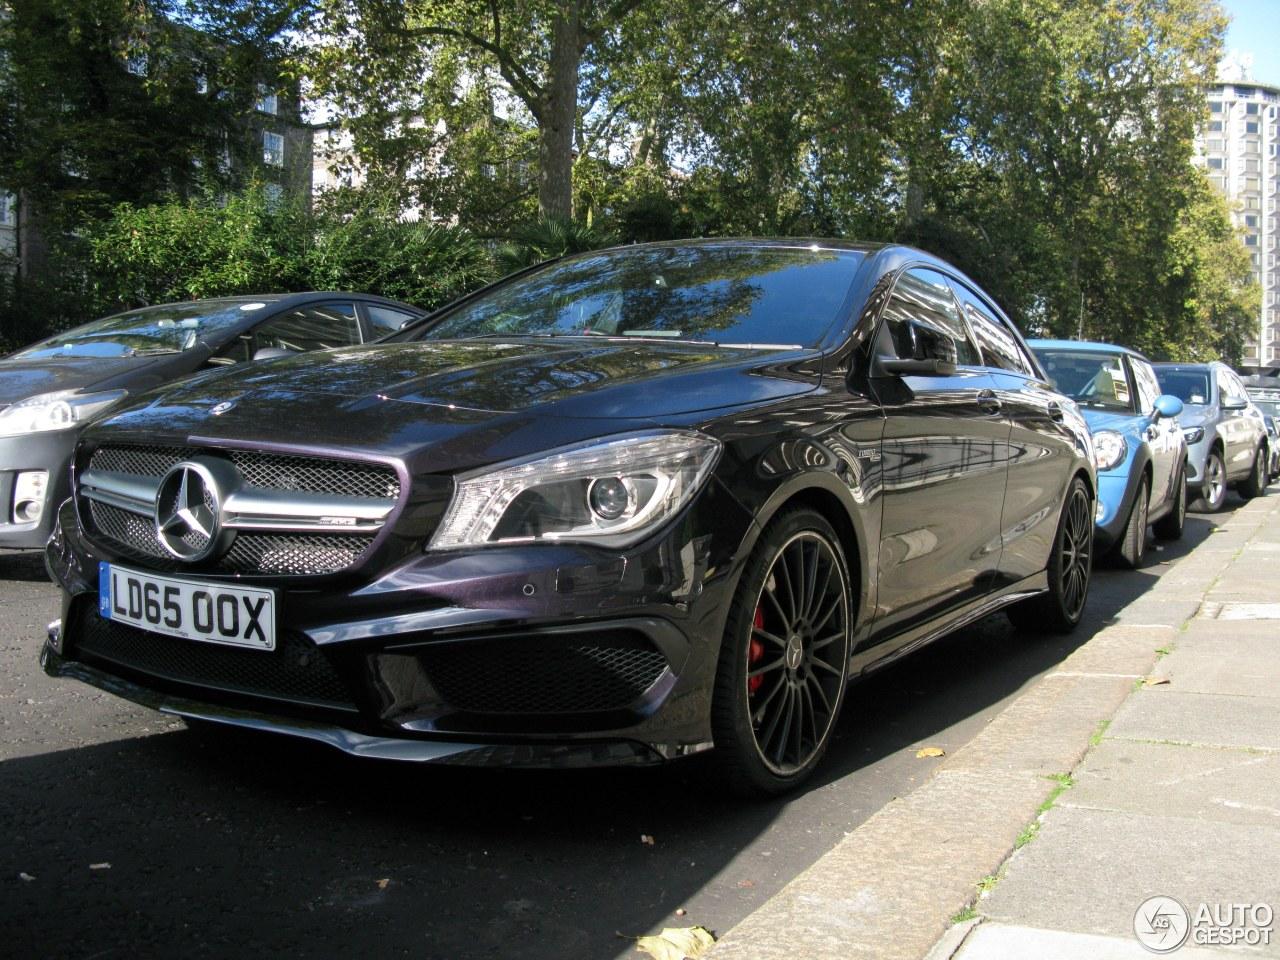 Mercedes benz cla 45 amg c117 25 october 2016 autogespot for Mercedes benz cla 250 amg price